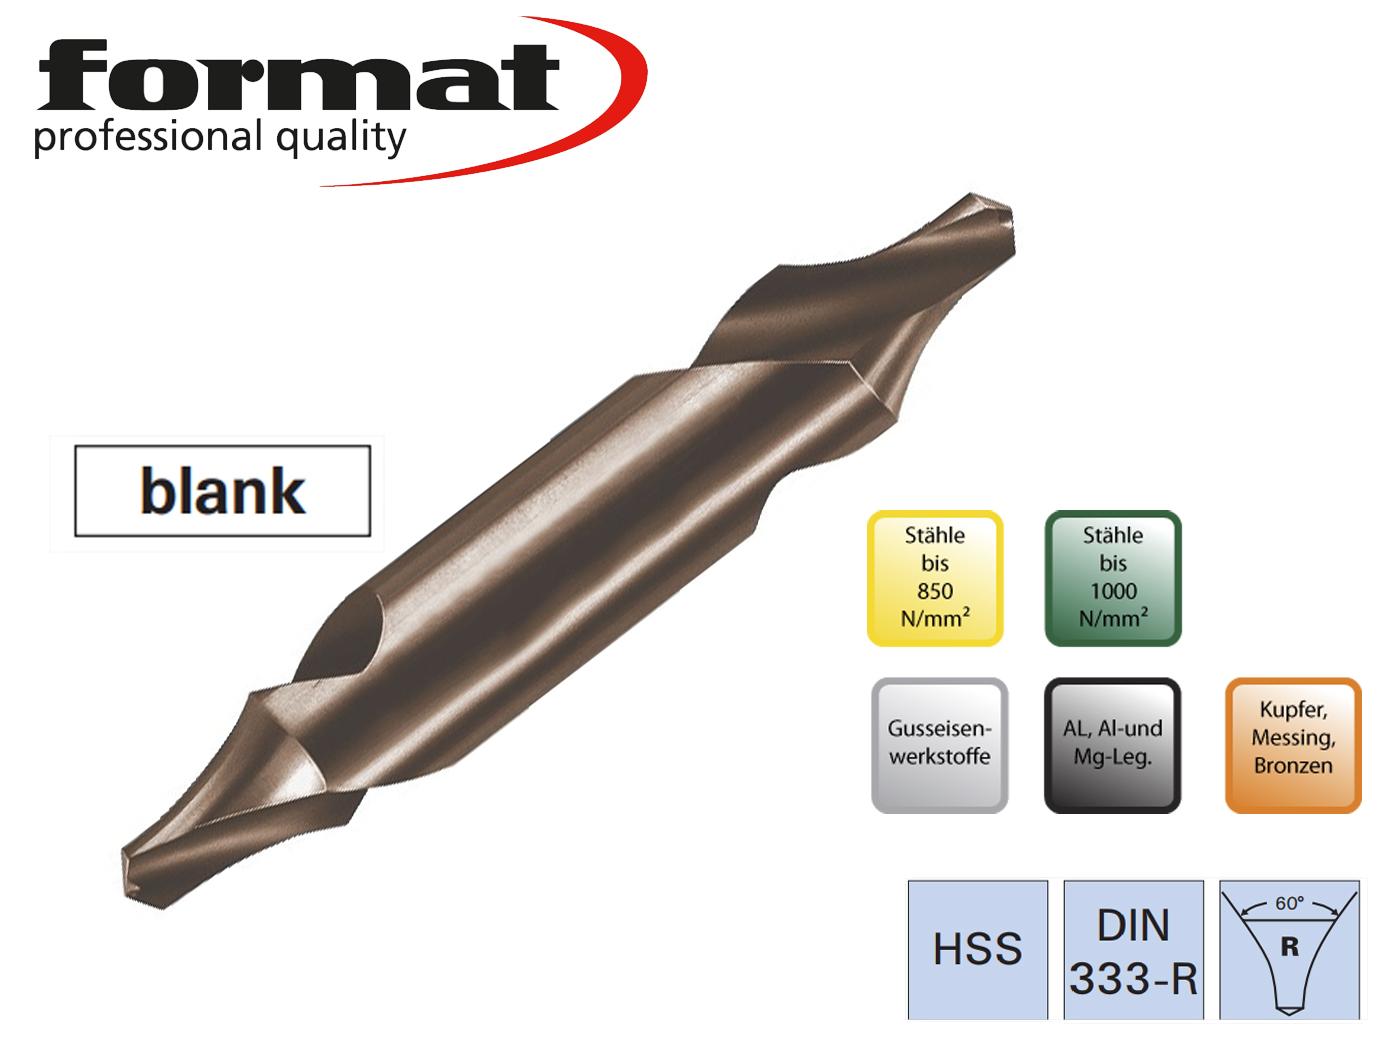 Centreerboren DIN 333 R FORMAT   DKMTools - DKM Tools